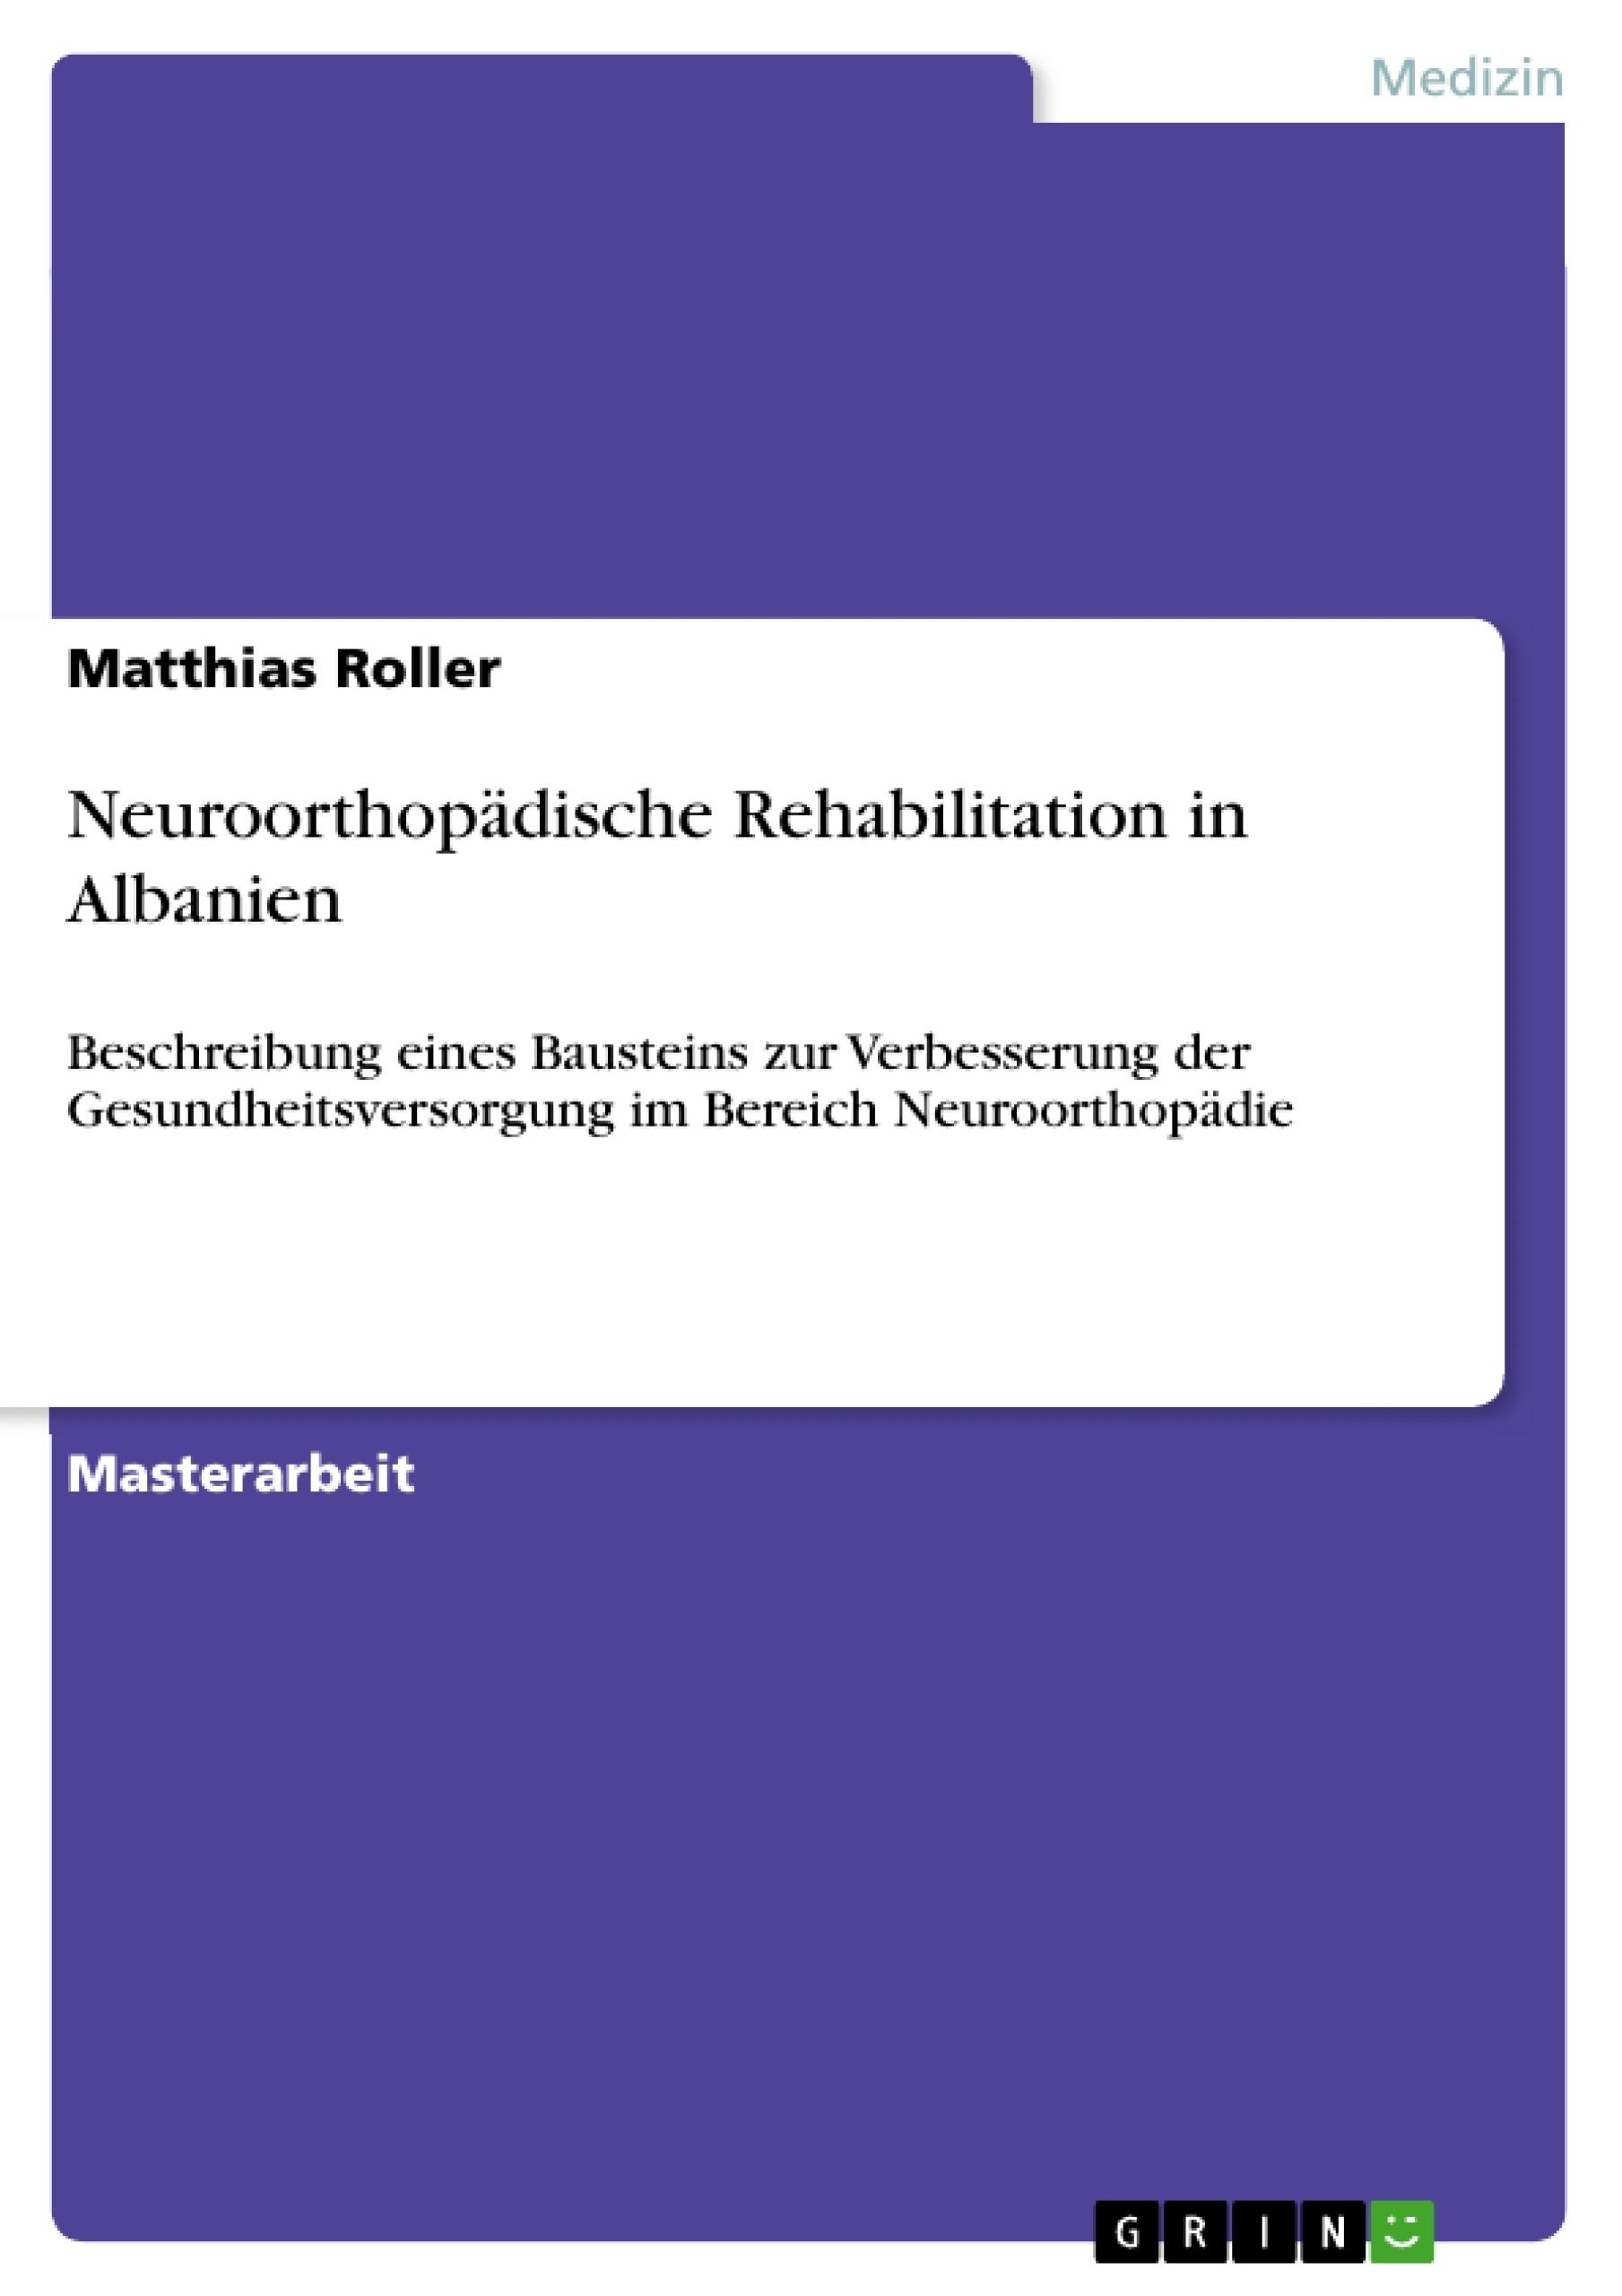 Titel: Neuroorthopädische Rehabilitation in Albanien